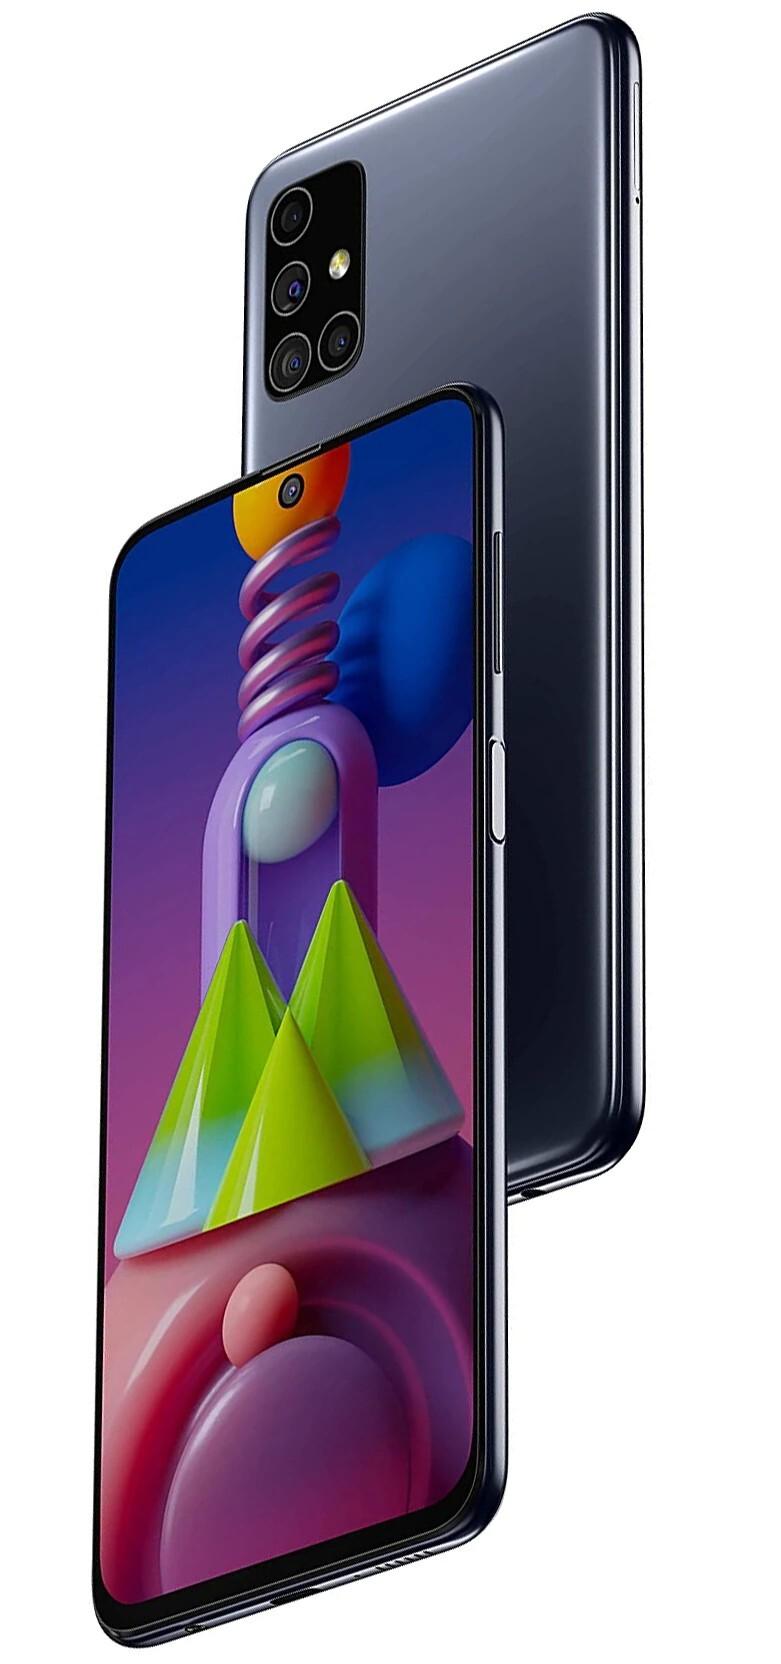 Samsung Galaxy M51 Celestial Black 8GB|128GB